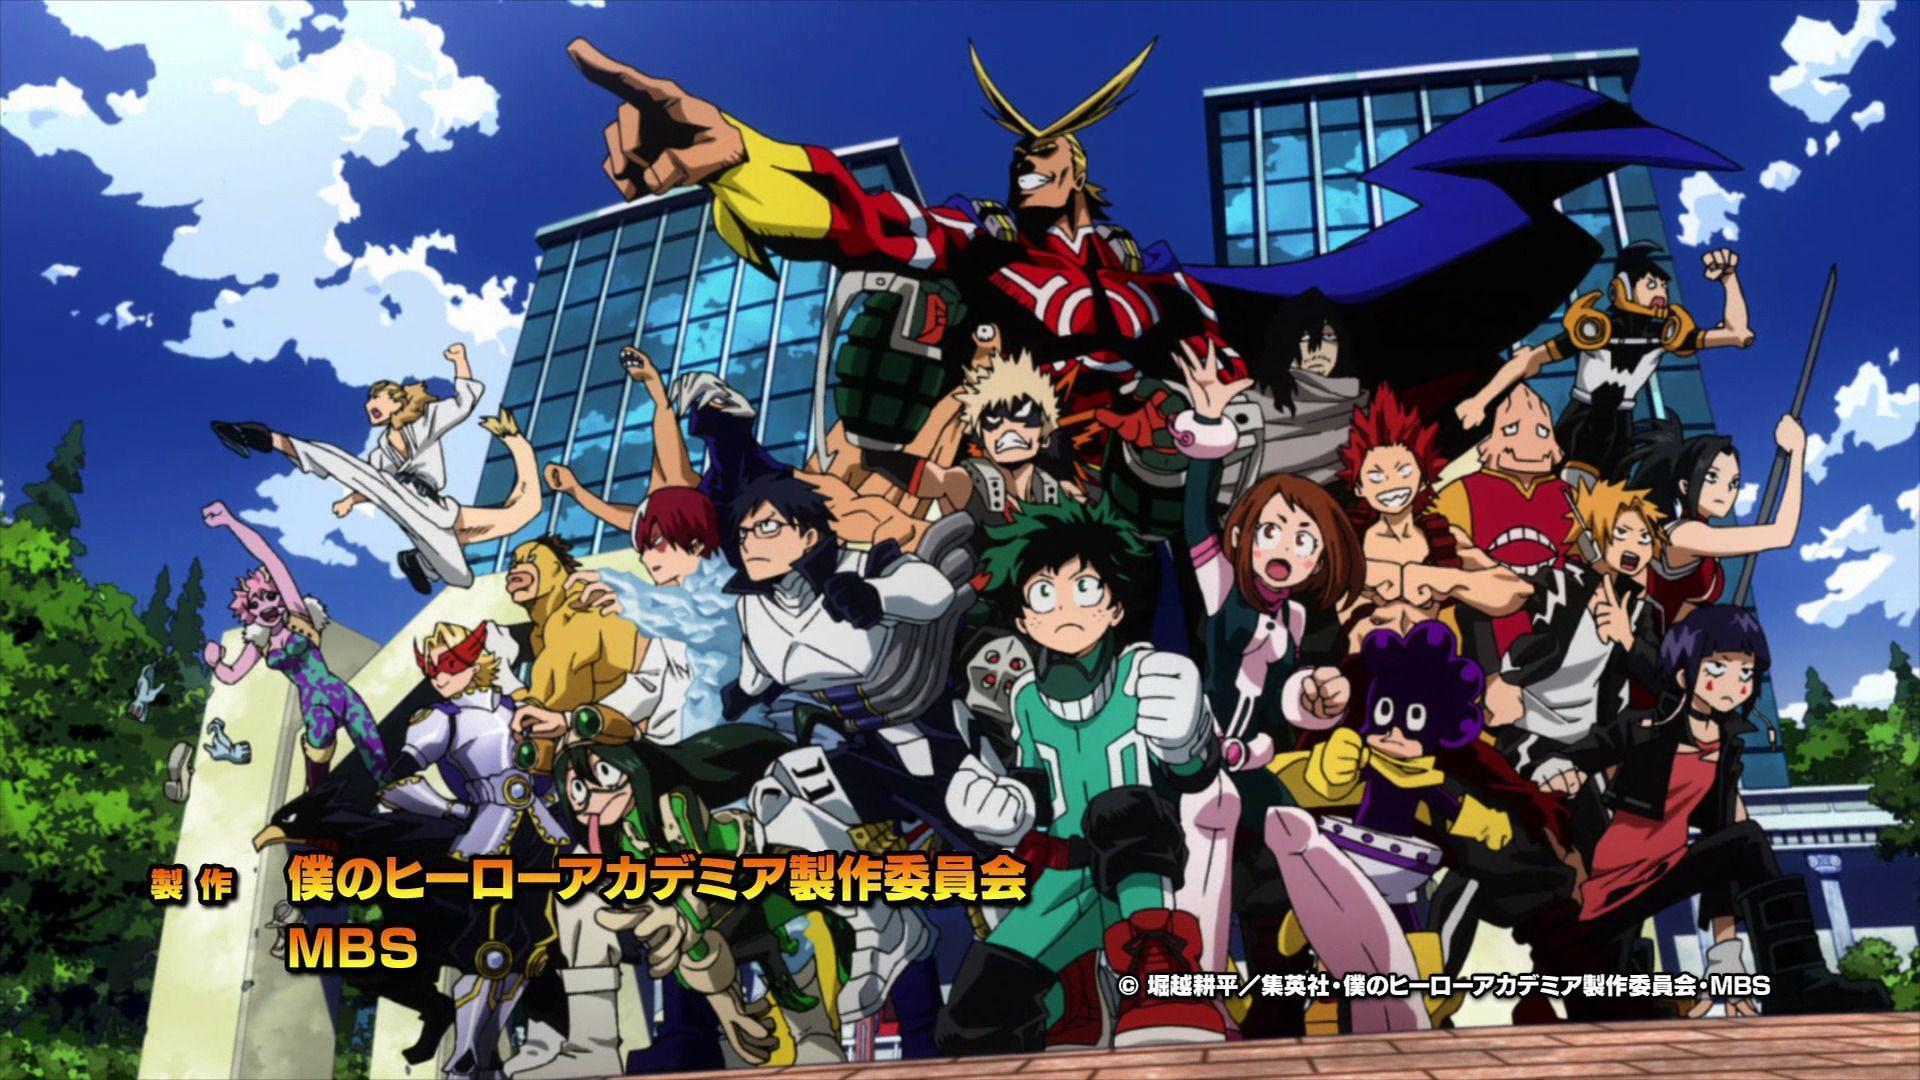 Boku No Hero Academia Background Posted By Sarah Johnson